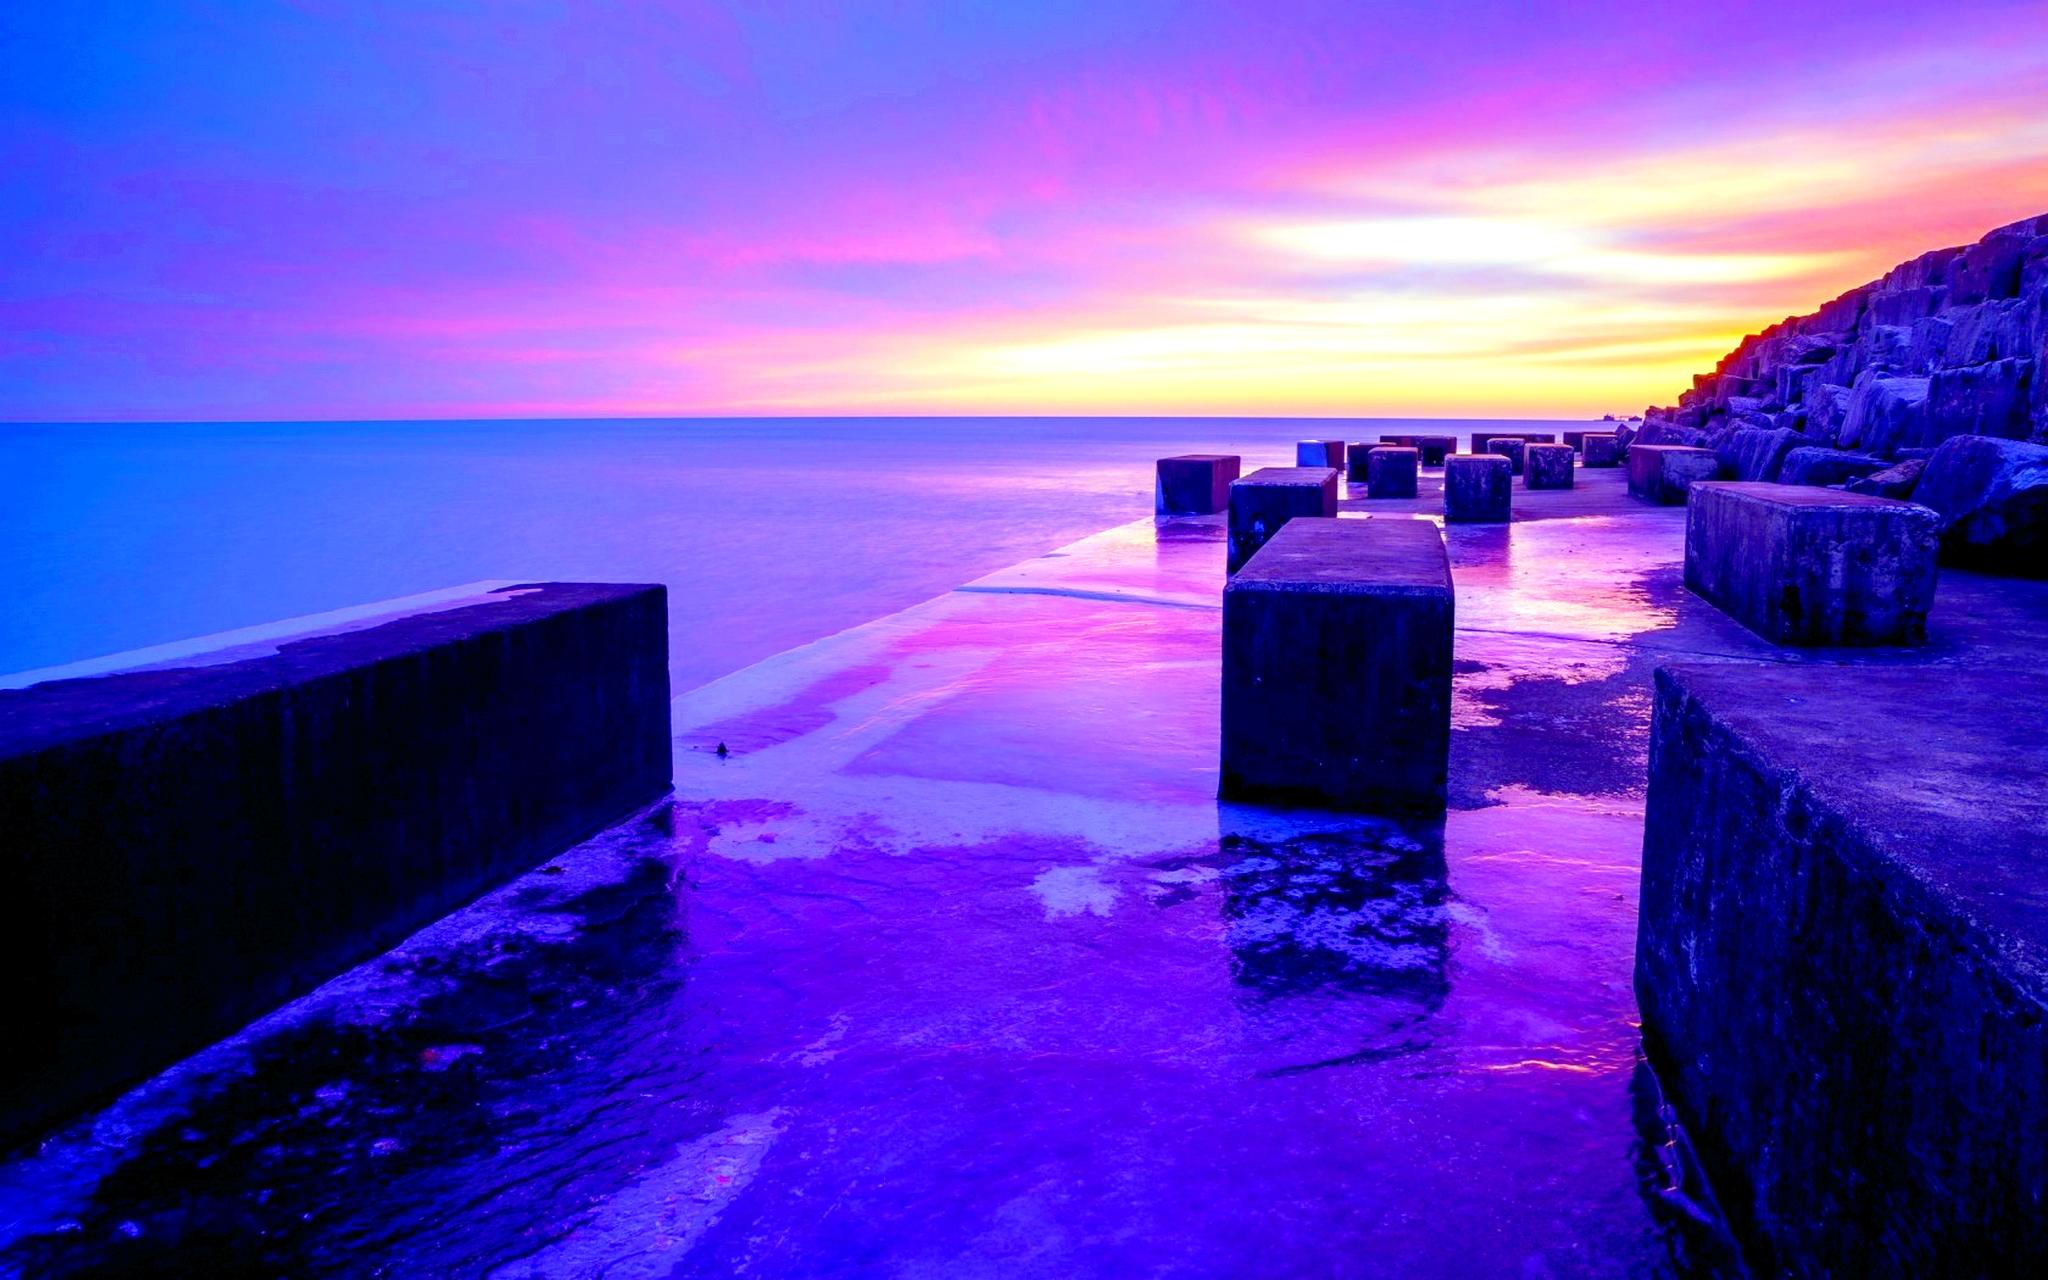 purple sunset wallpaper 23192